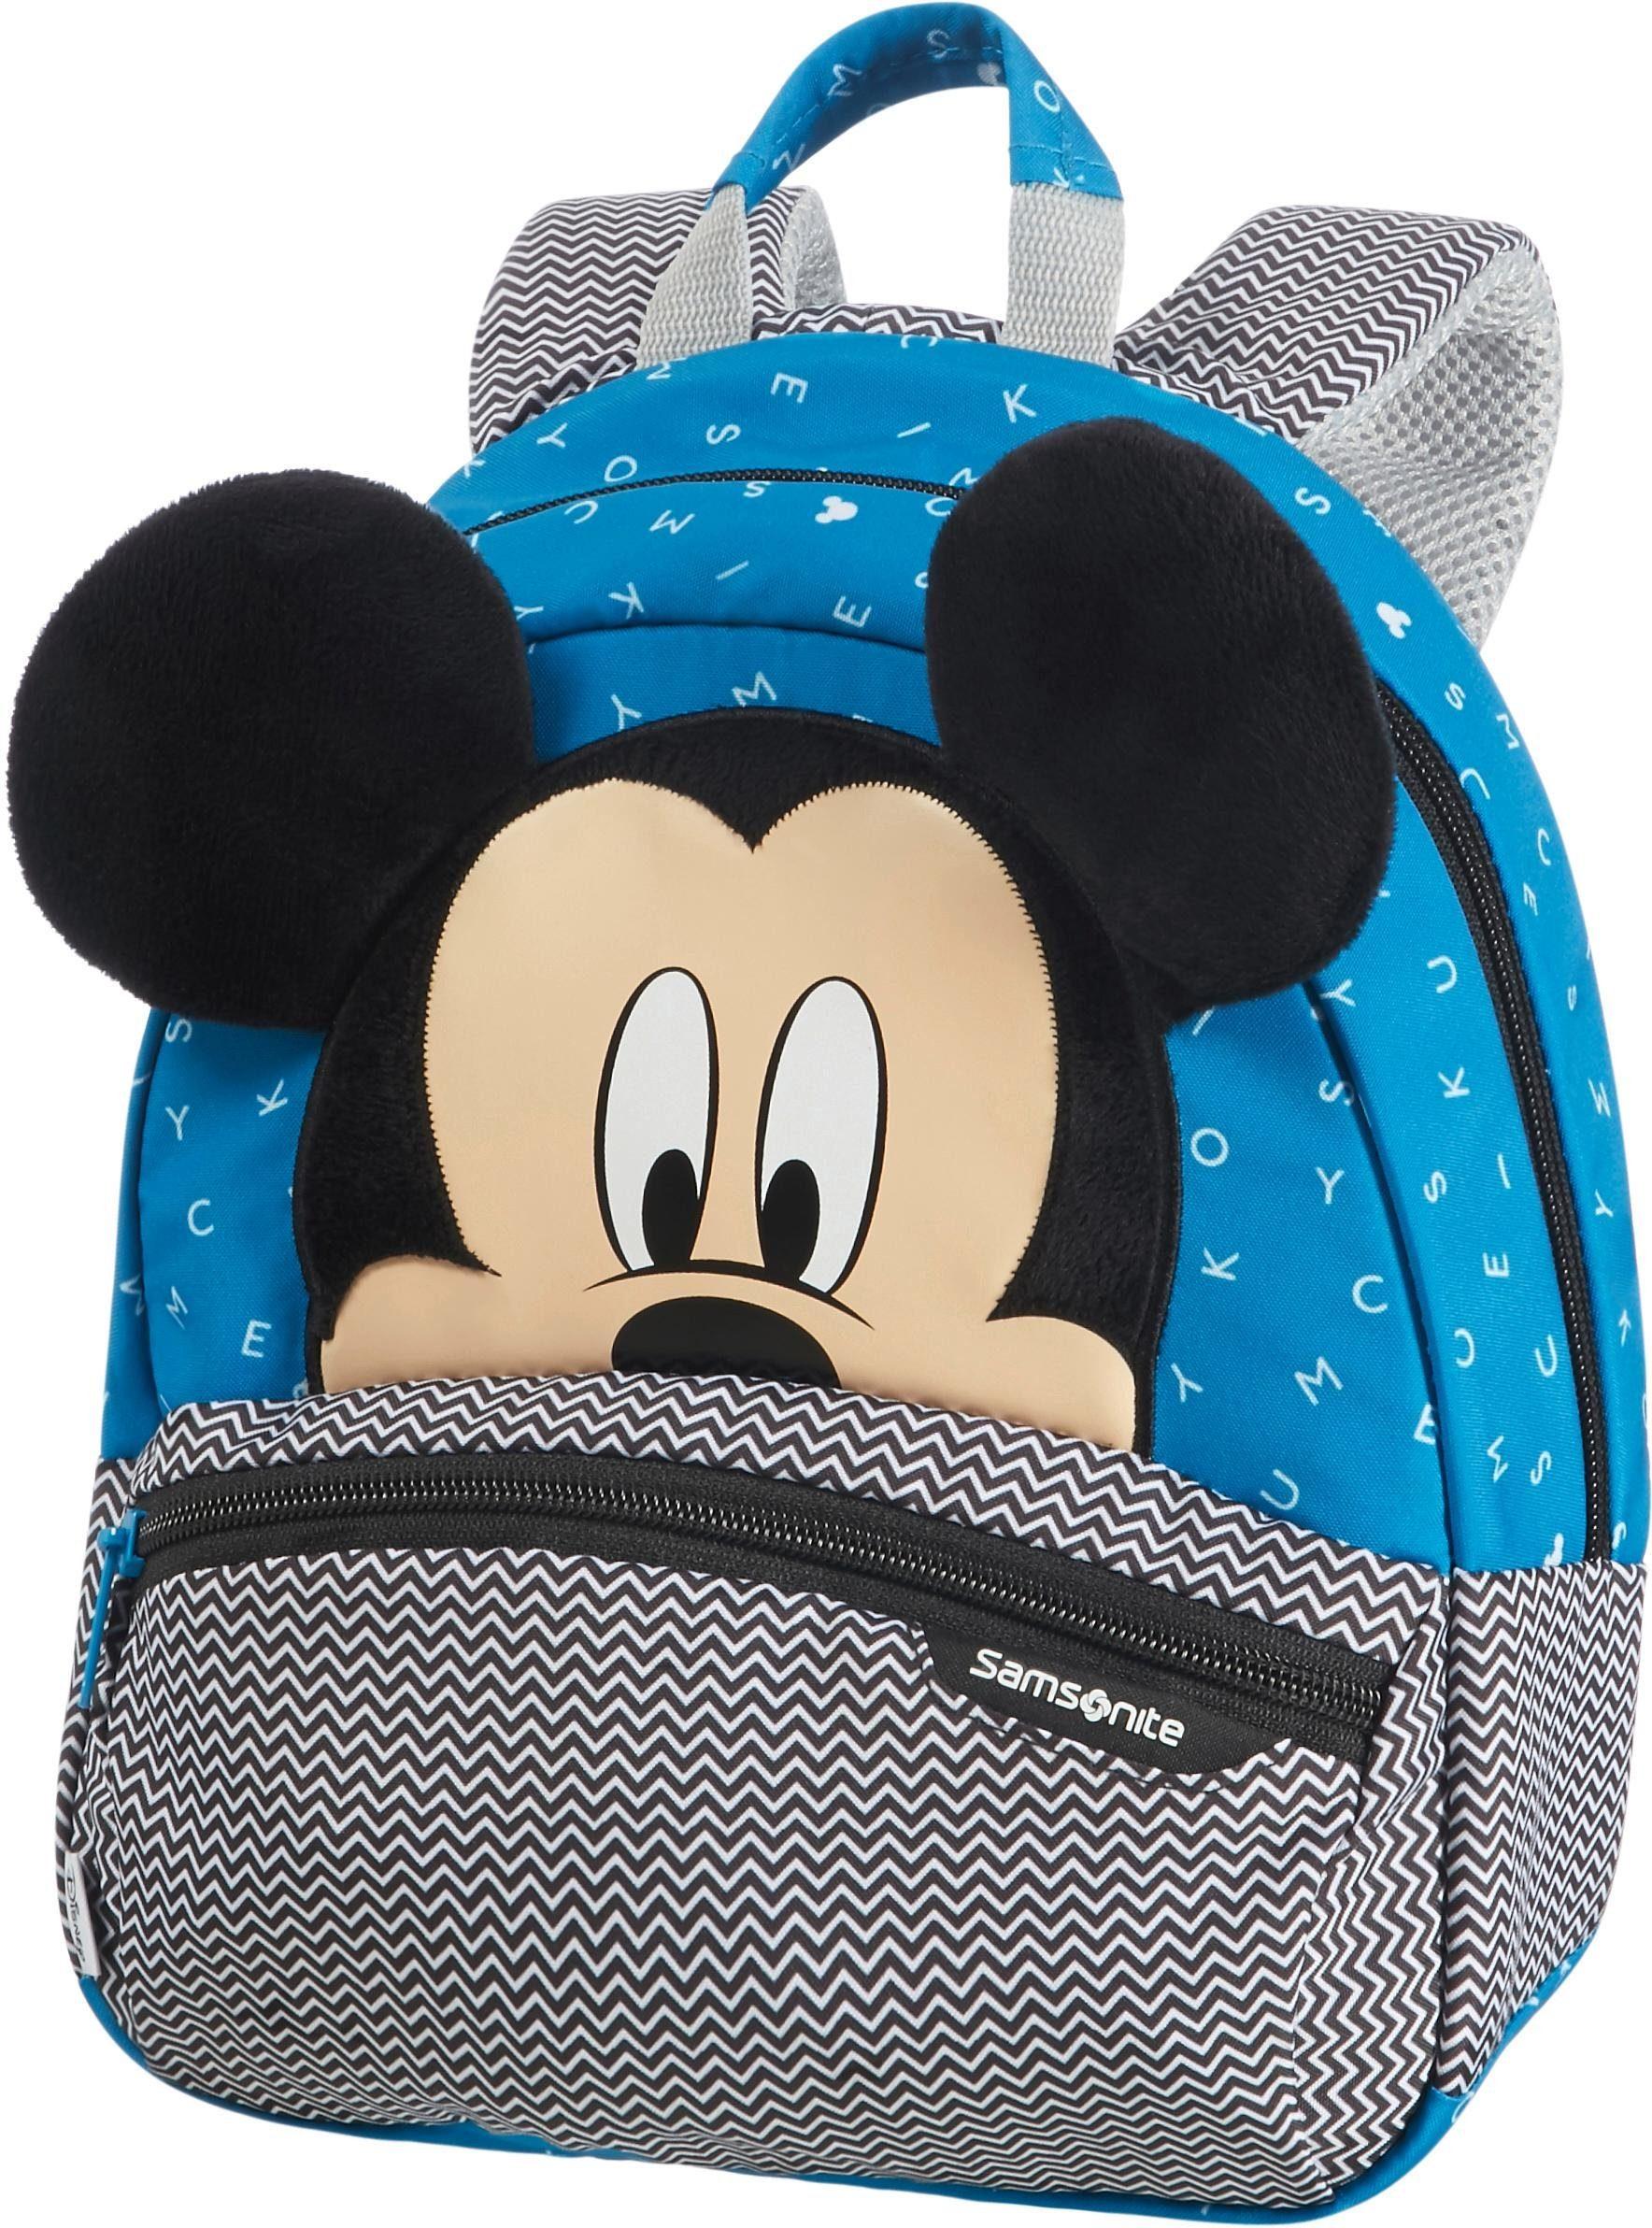 Samsonite Rucksack für Kinder, »Disney Ultimate 2.0, S, Mickey Letters«